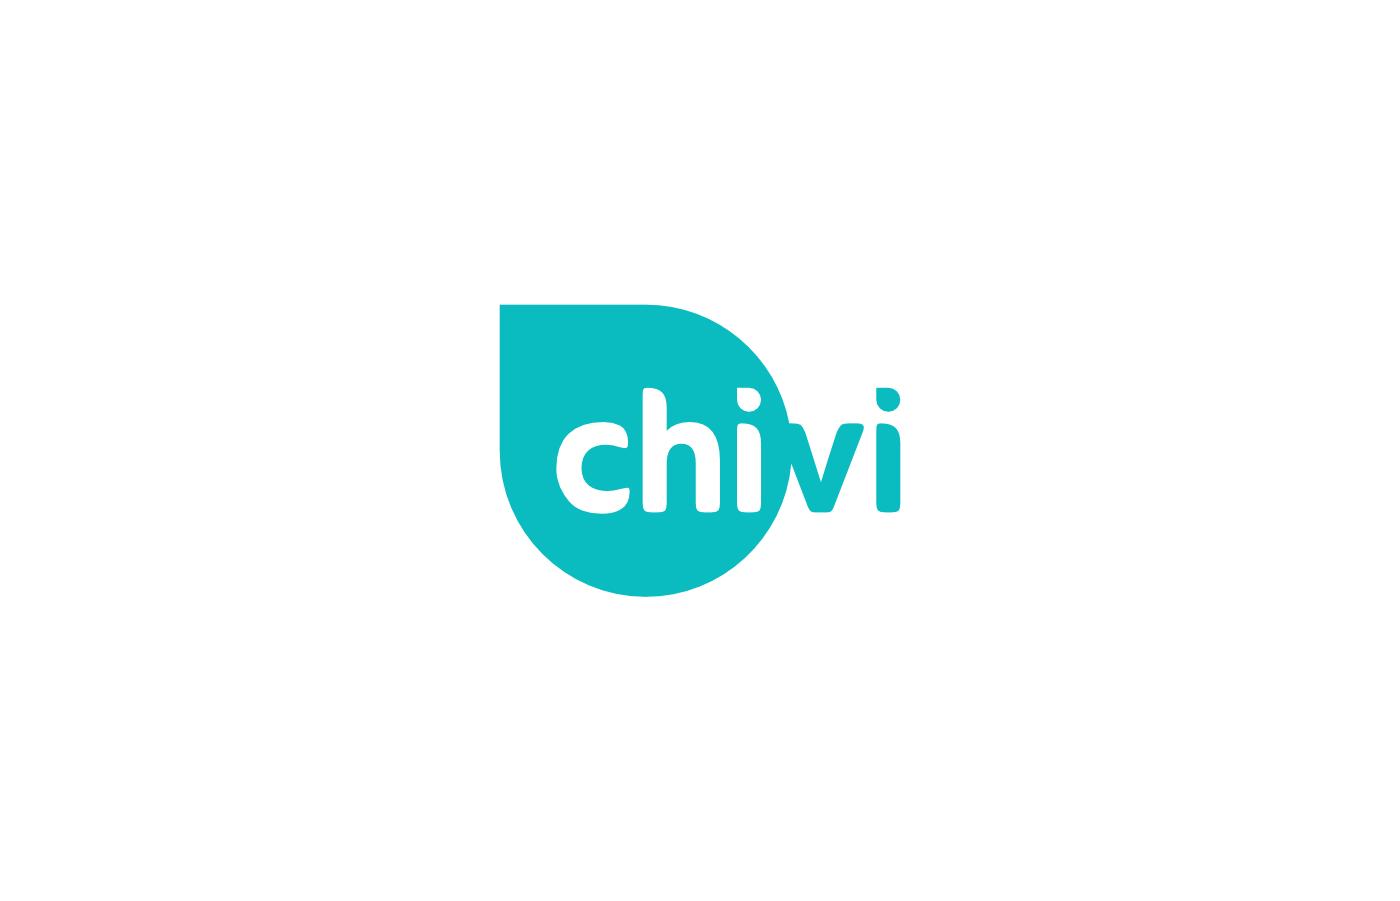 chivi Wellness logo branding  design CHI Health energy live Nature